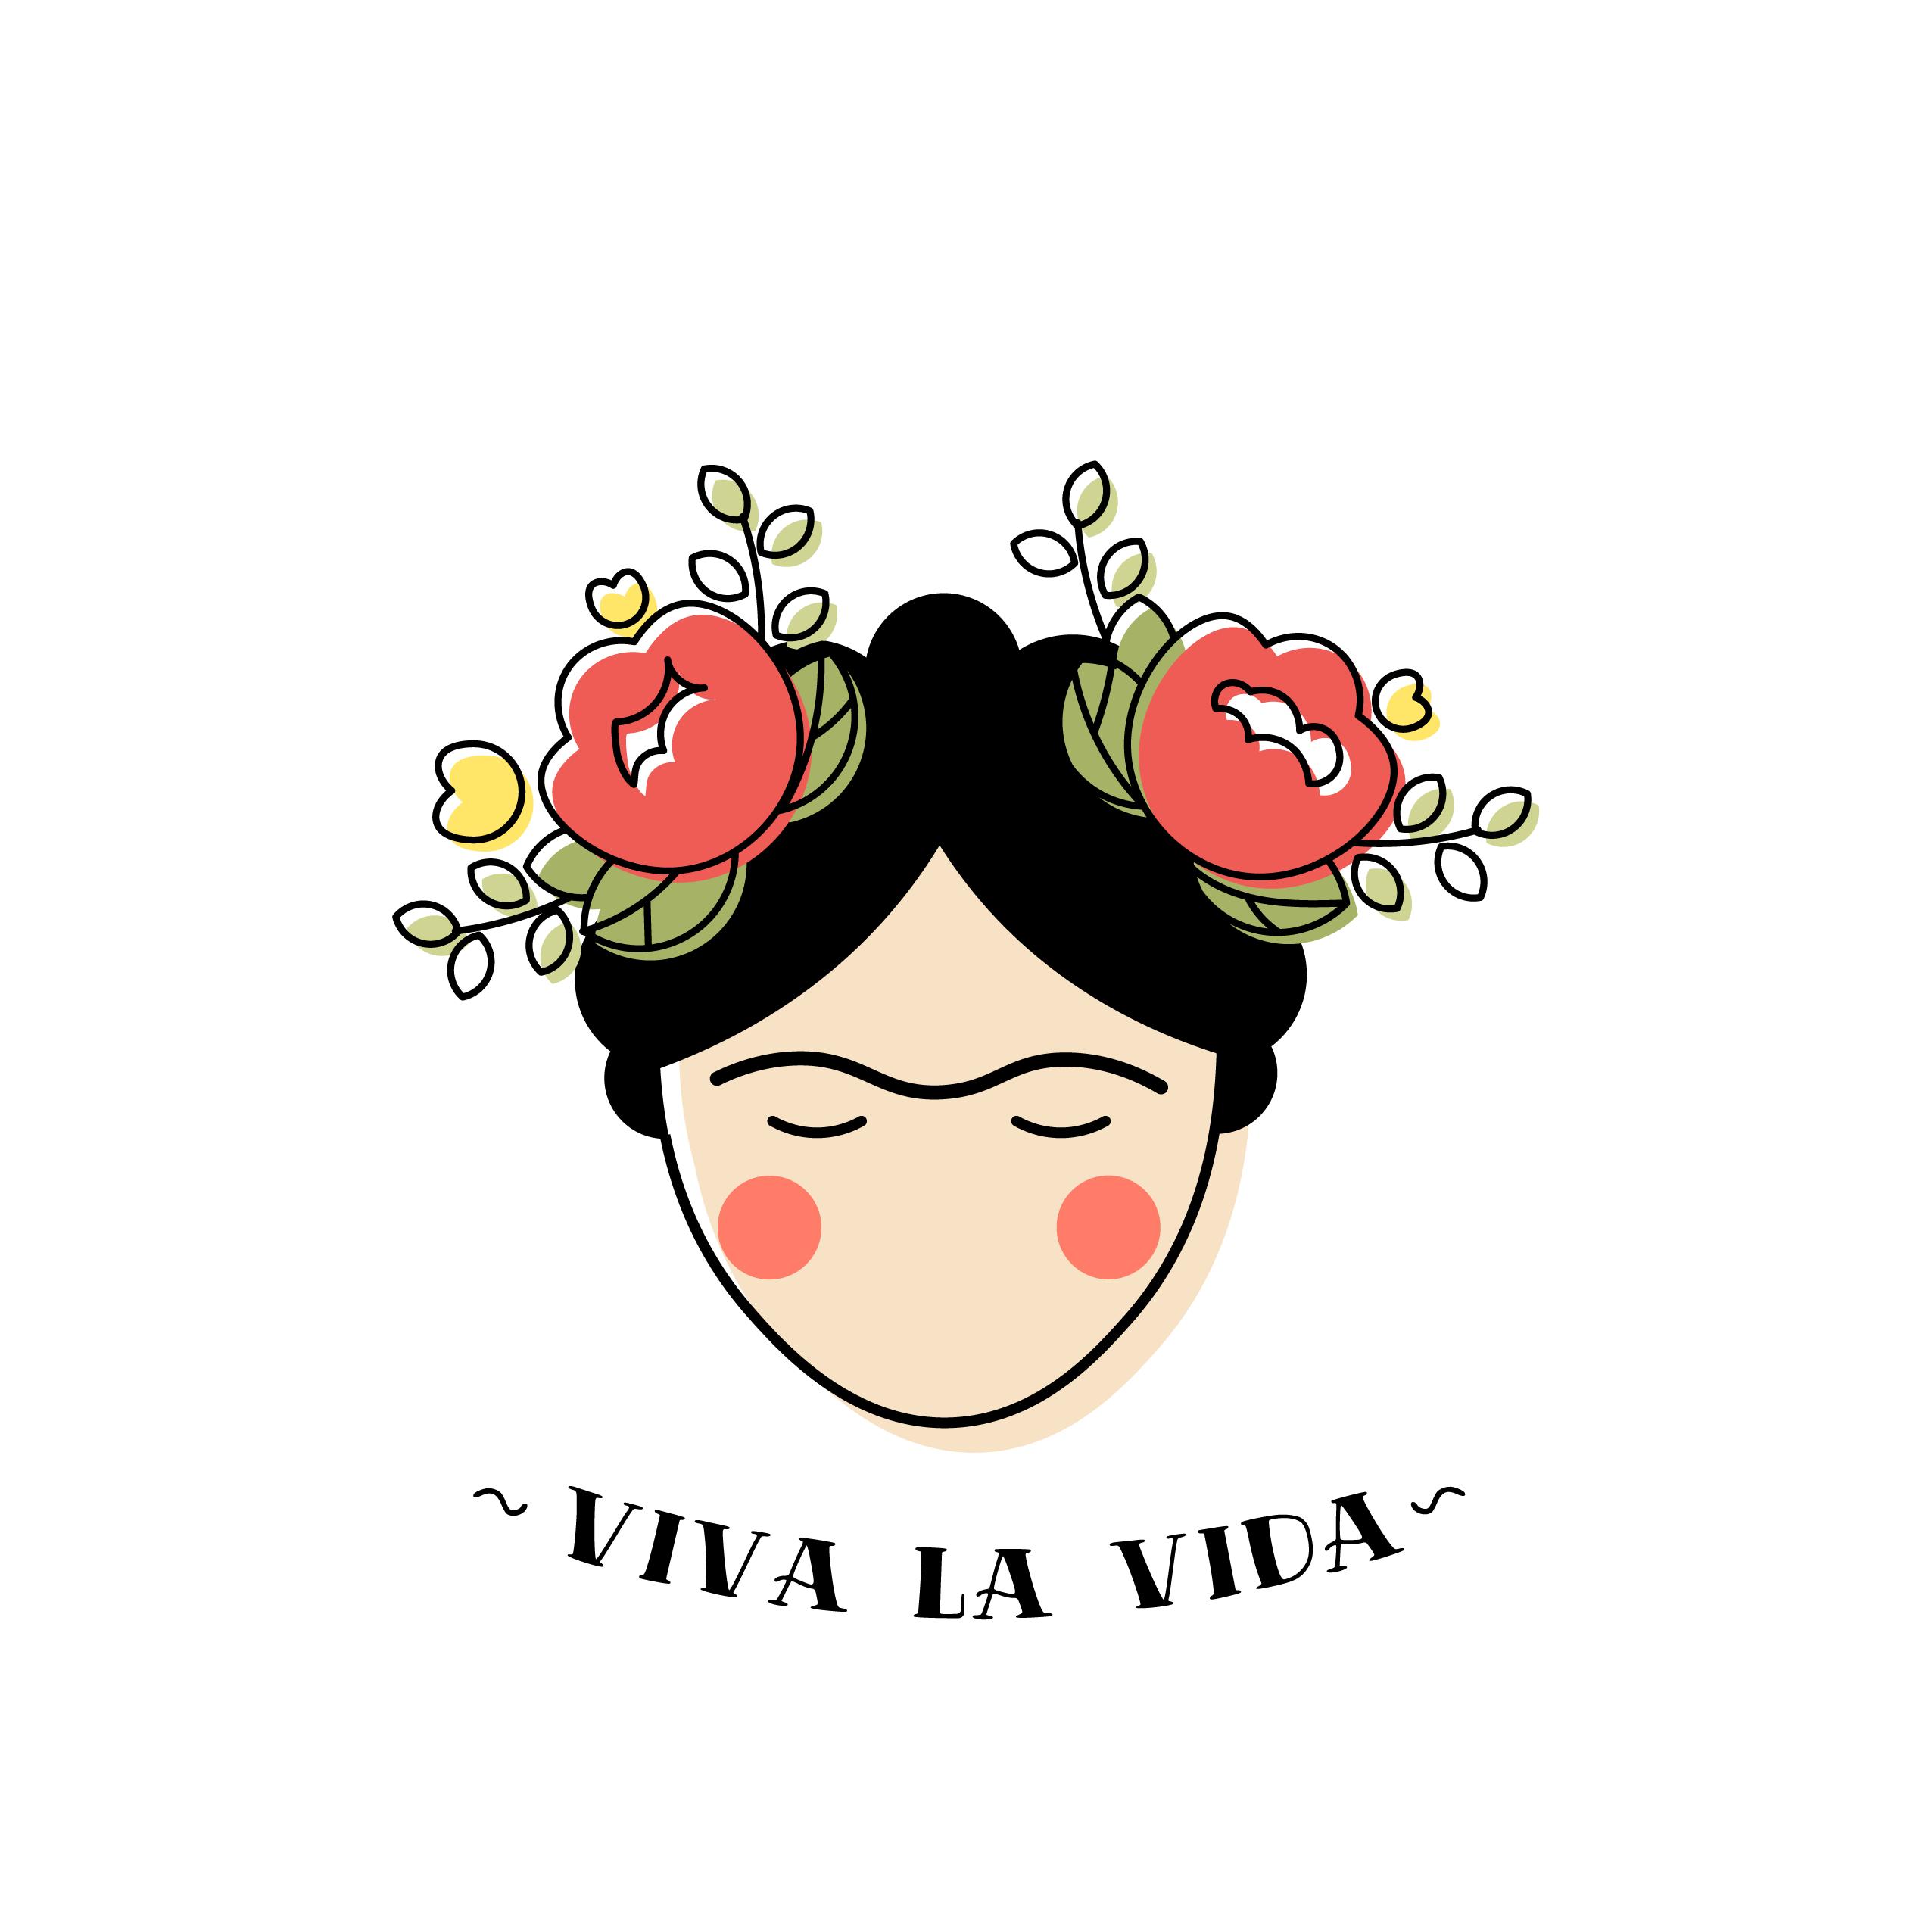 Illyustraciya Frida Kalo Kahlo Paintings Iconic Wallpaper Easy Drawings